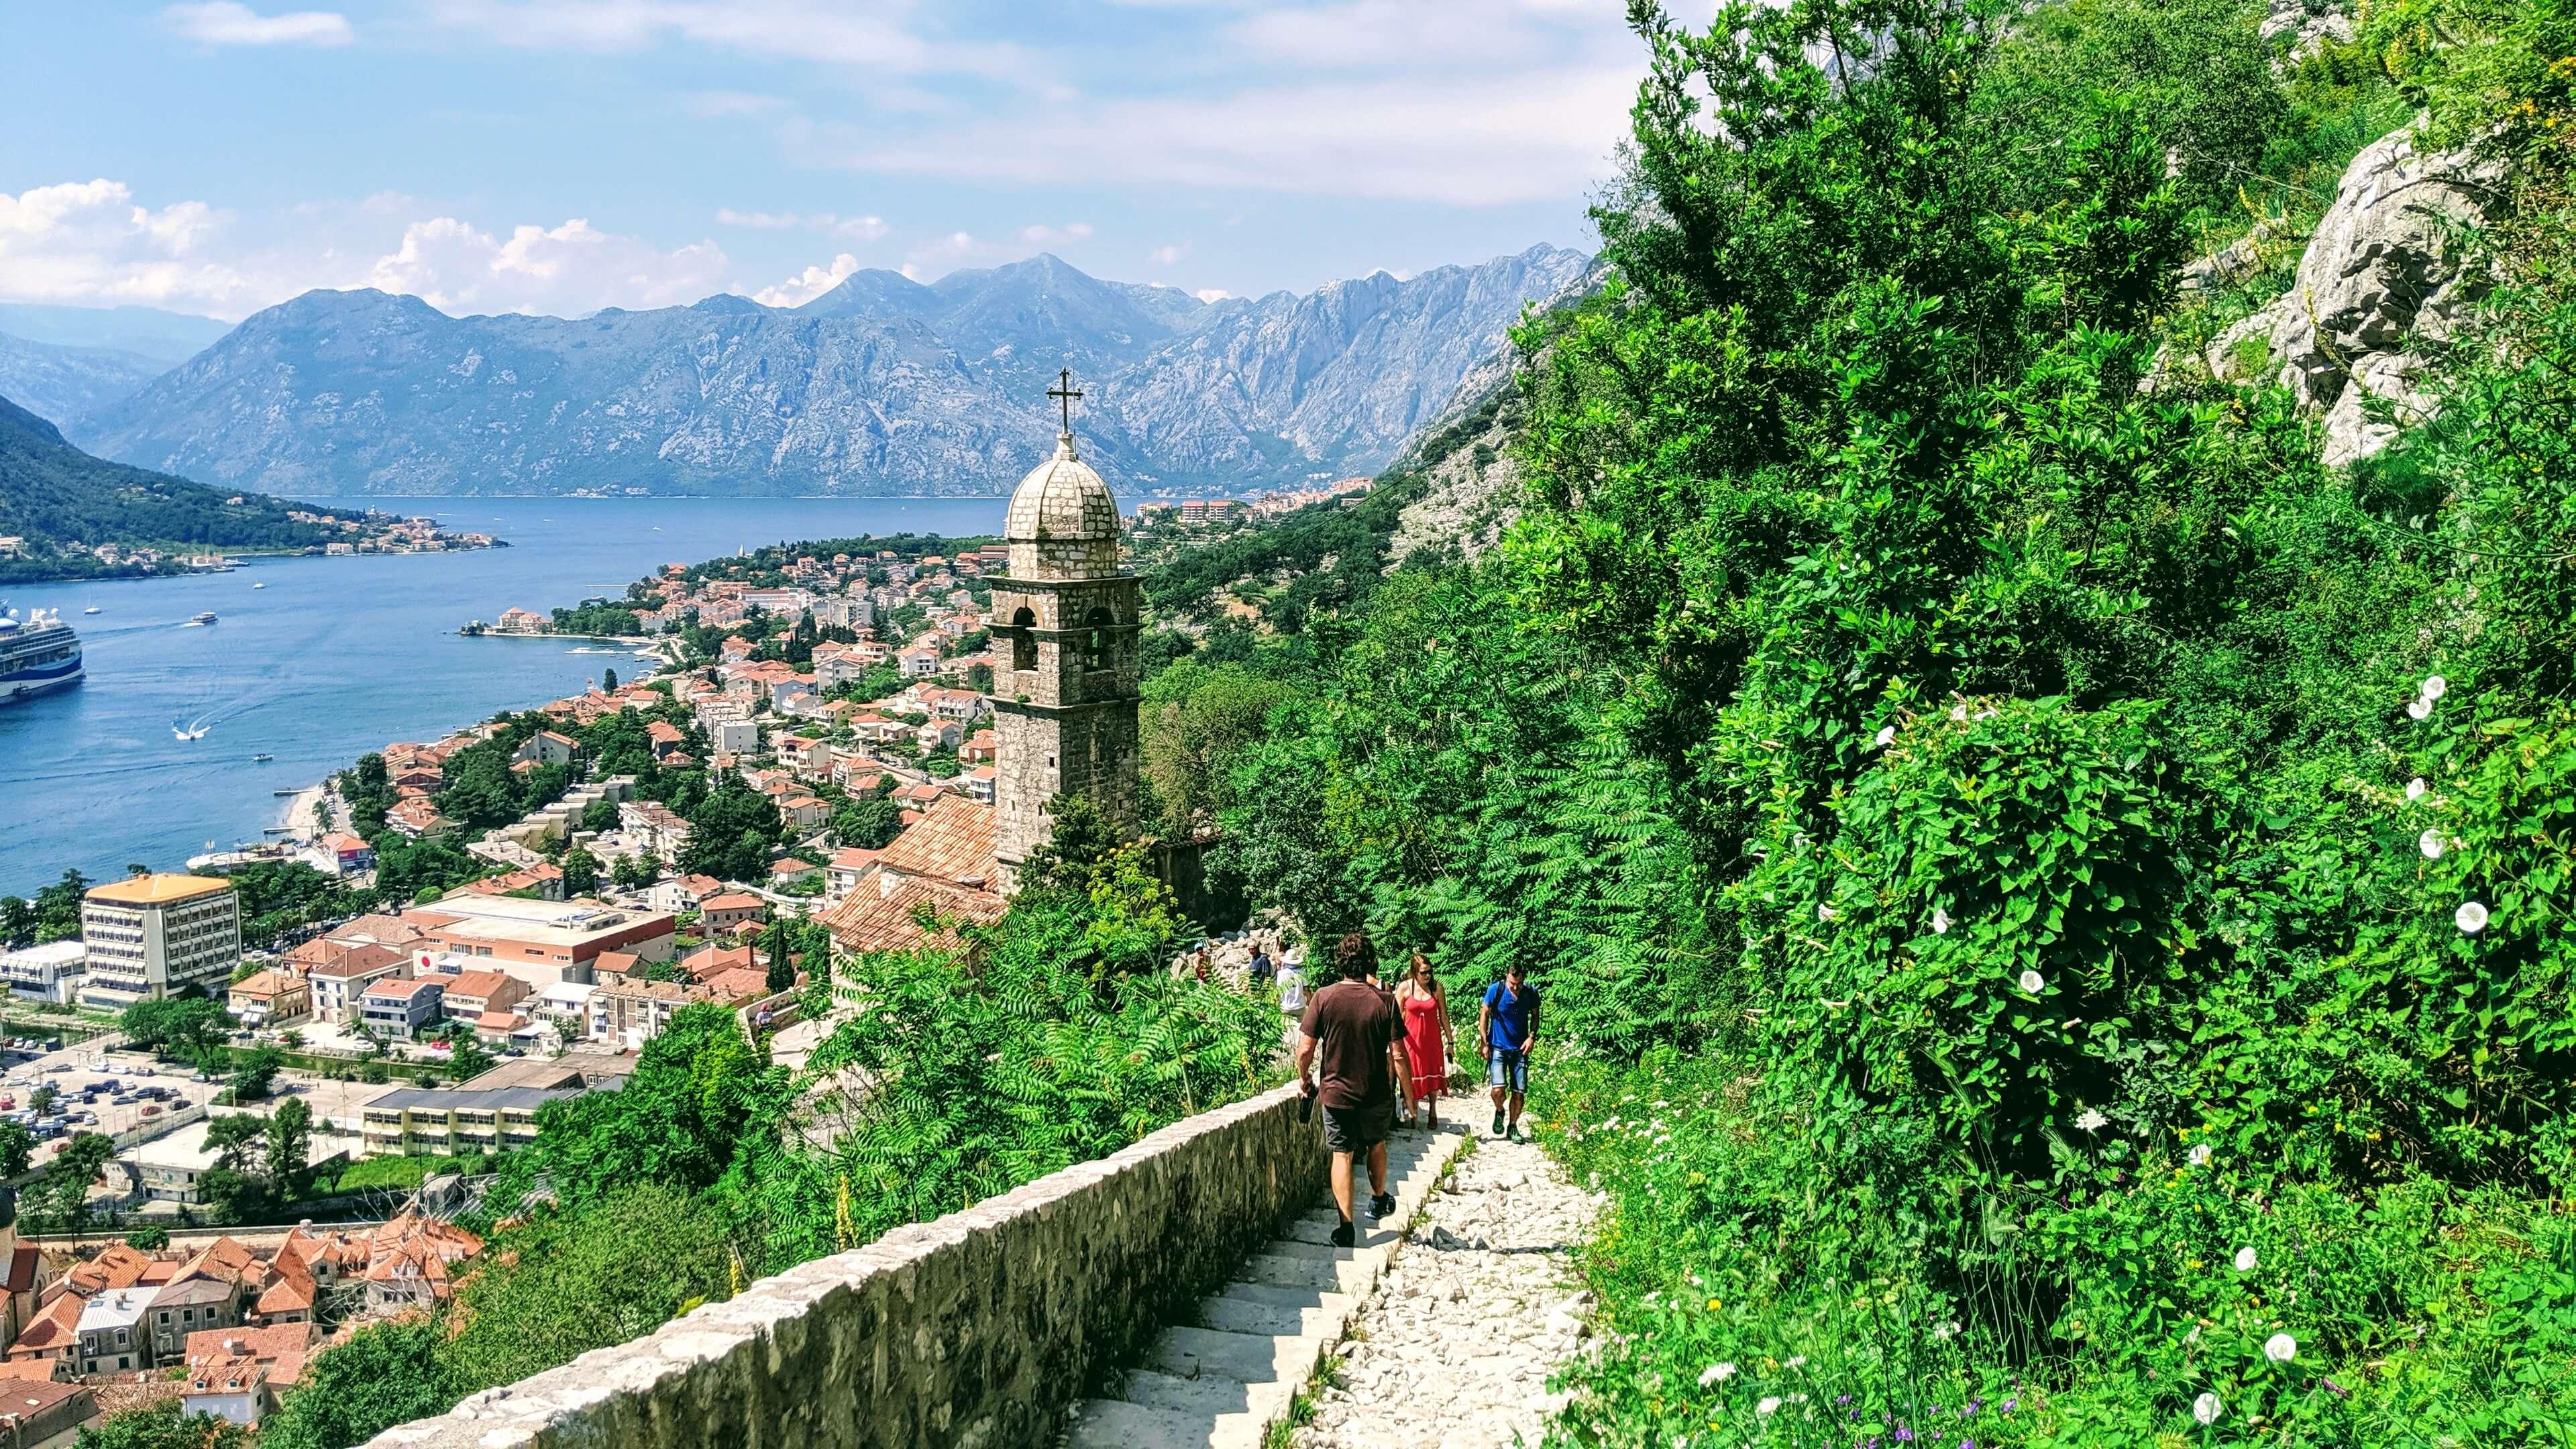 Fortress of Kotor overlooking Kotor Bay